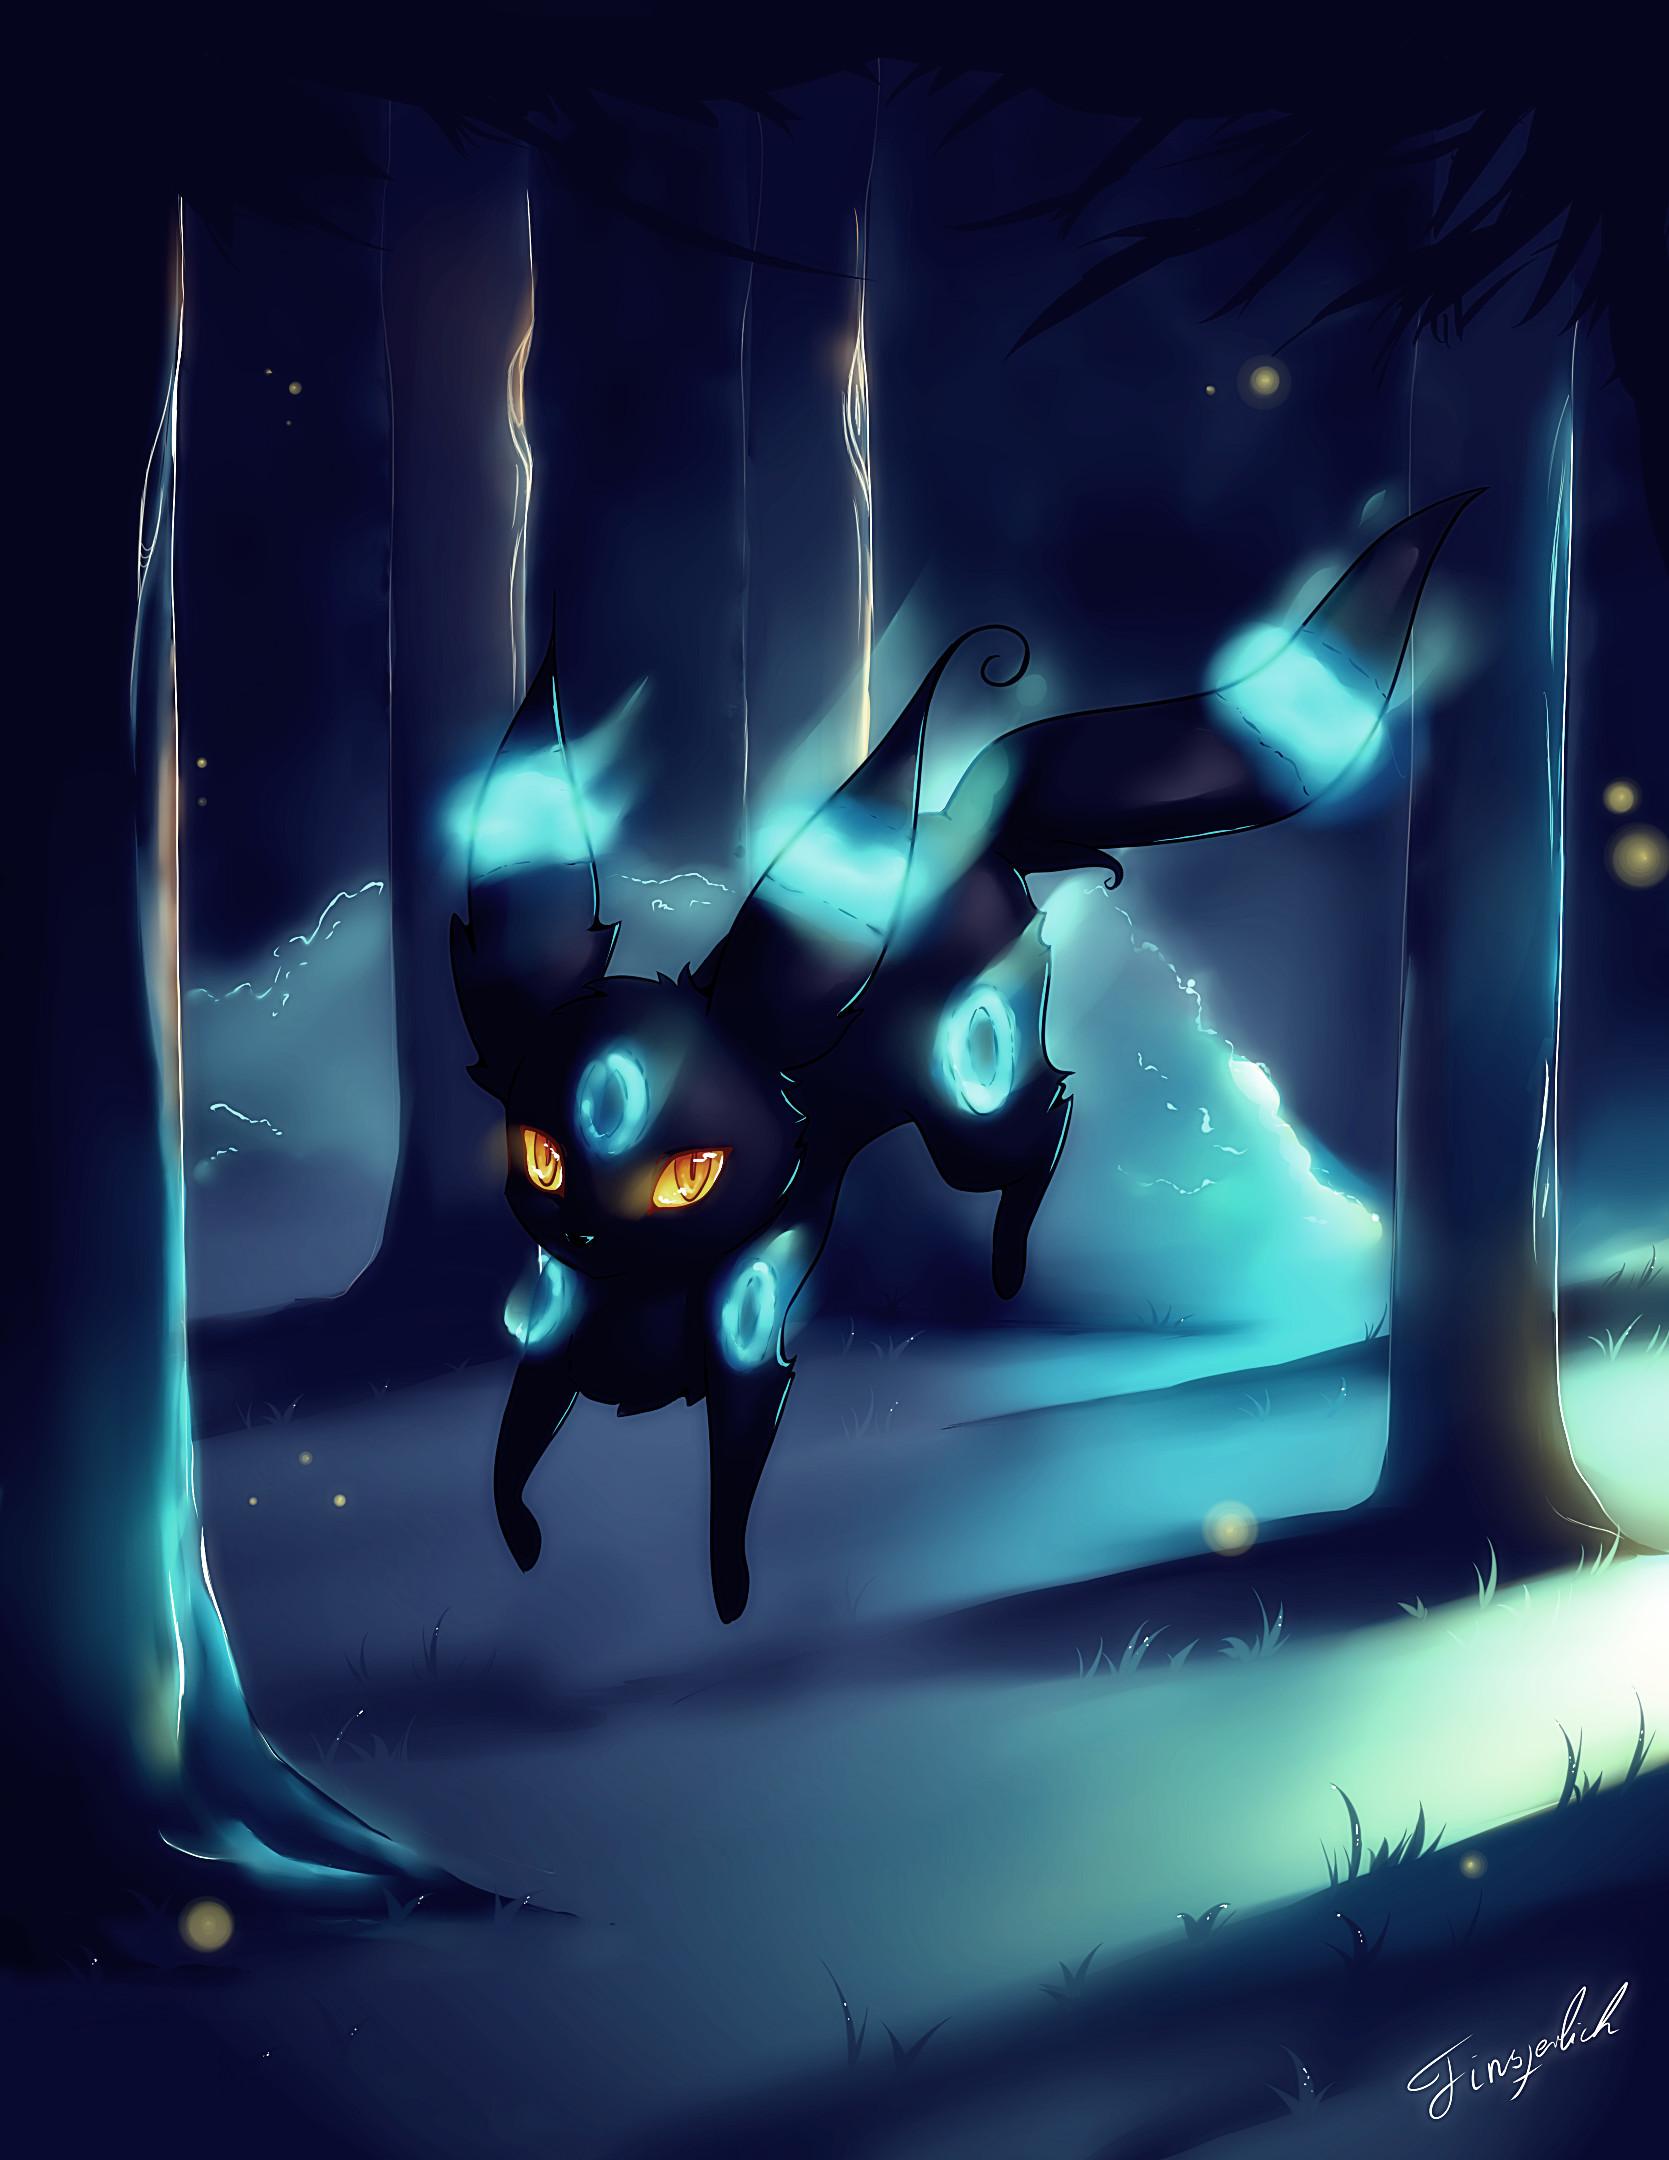 … Shiny Umbreon, Pokemon (with Speedpaint Video) by FinsterlichArt